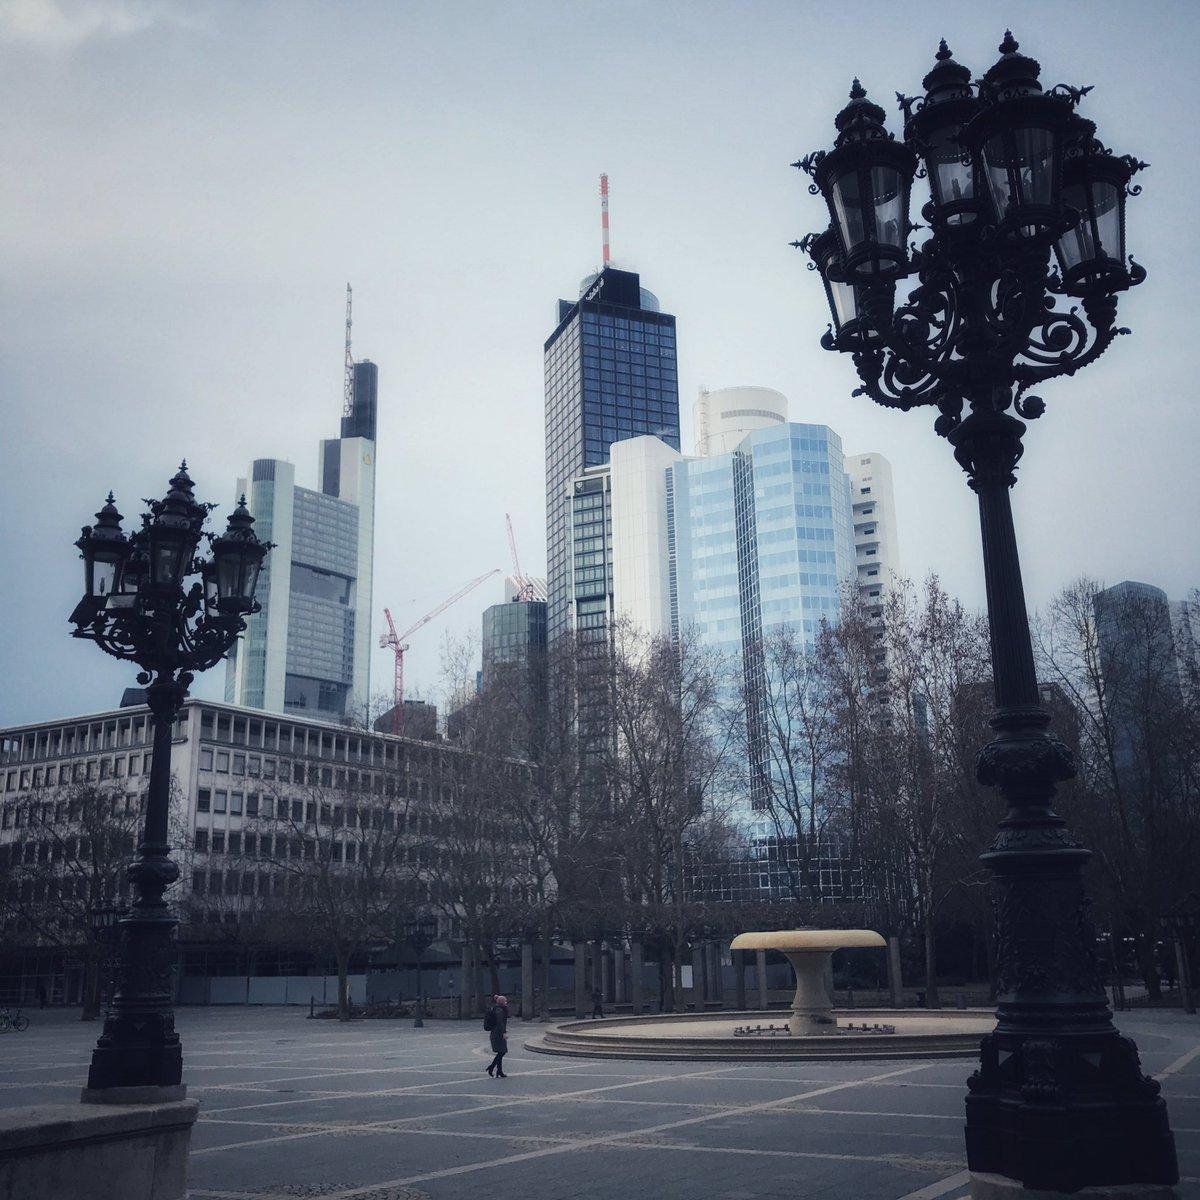 Morgen Frankfurt guten morgen frankfurt meteorologischer frühlingsanfang klar